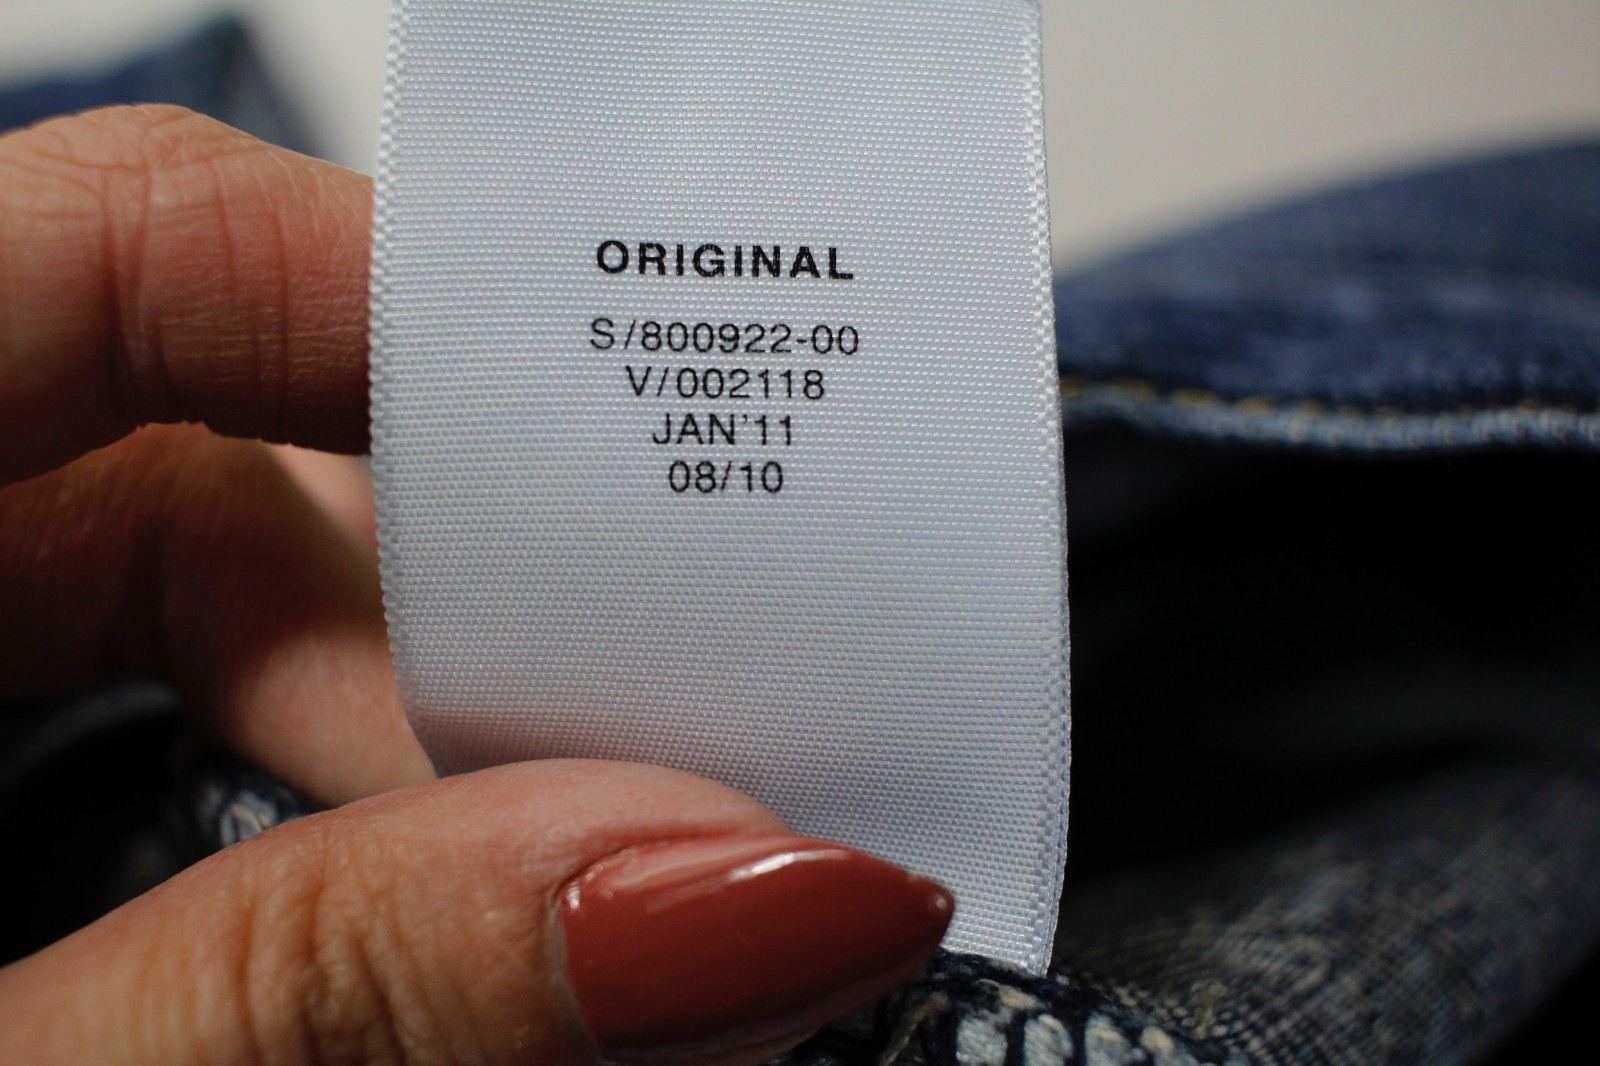 Gap Kids Logo Full Zip Hoodie Sweatshirt + Jeans Girls Size L 10 Outfit Set  image 7